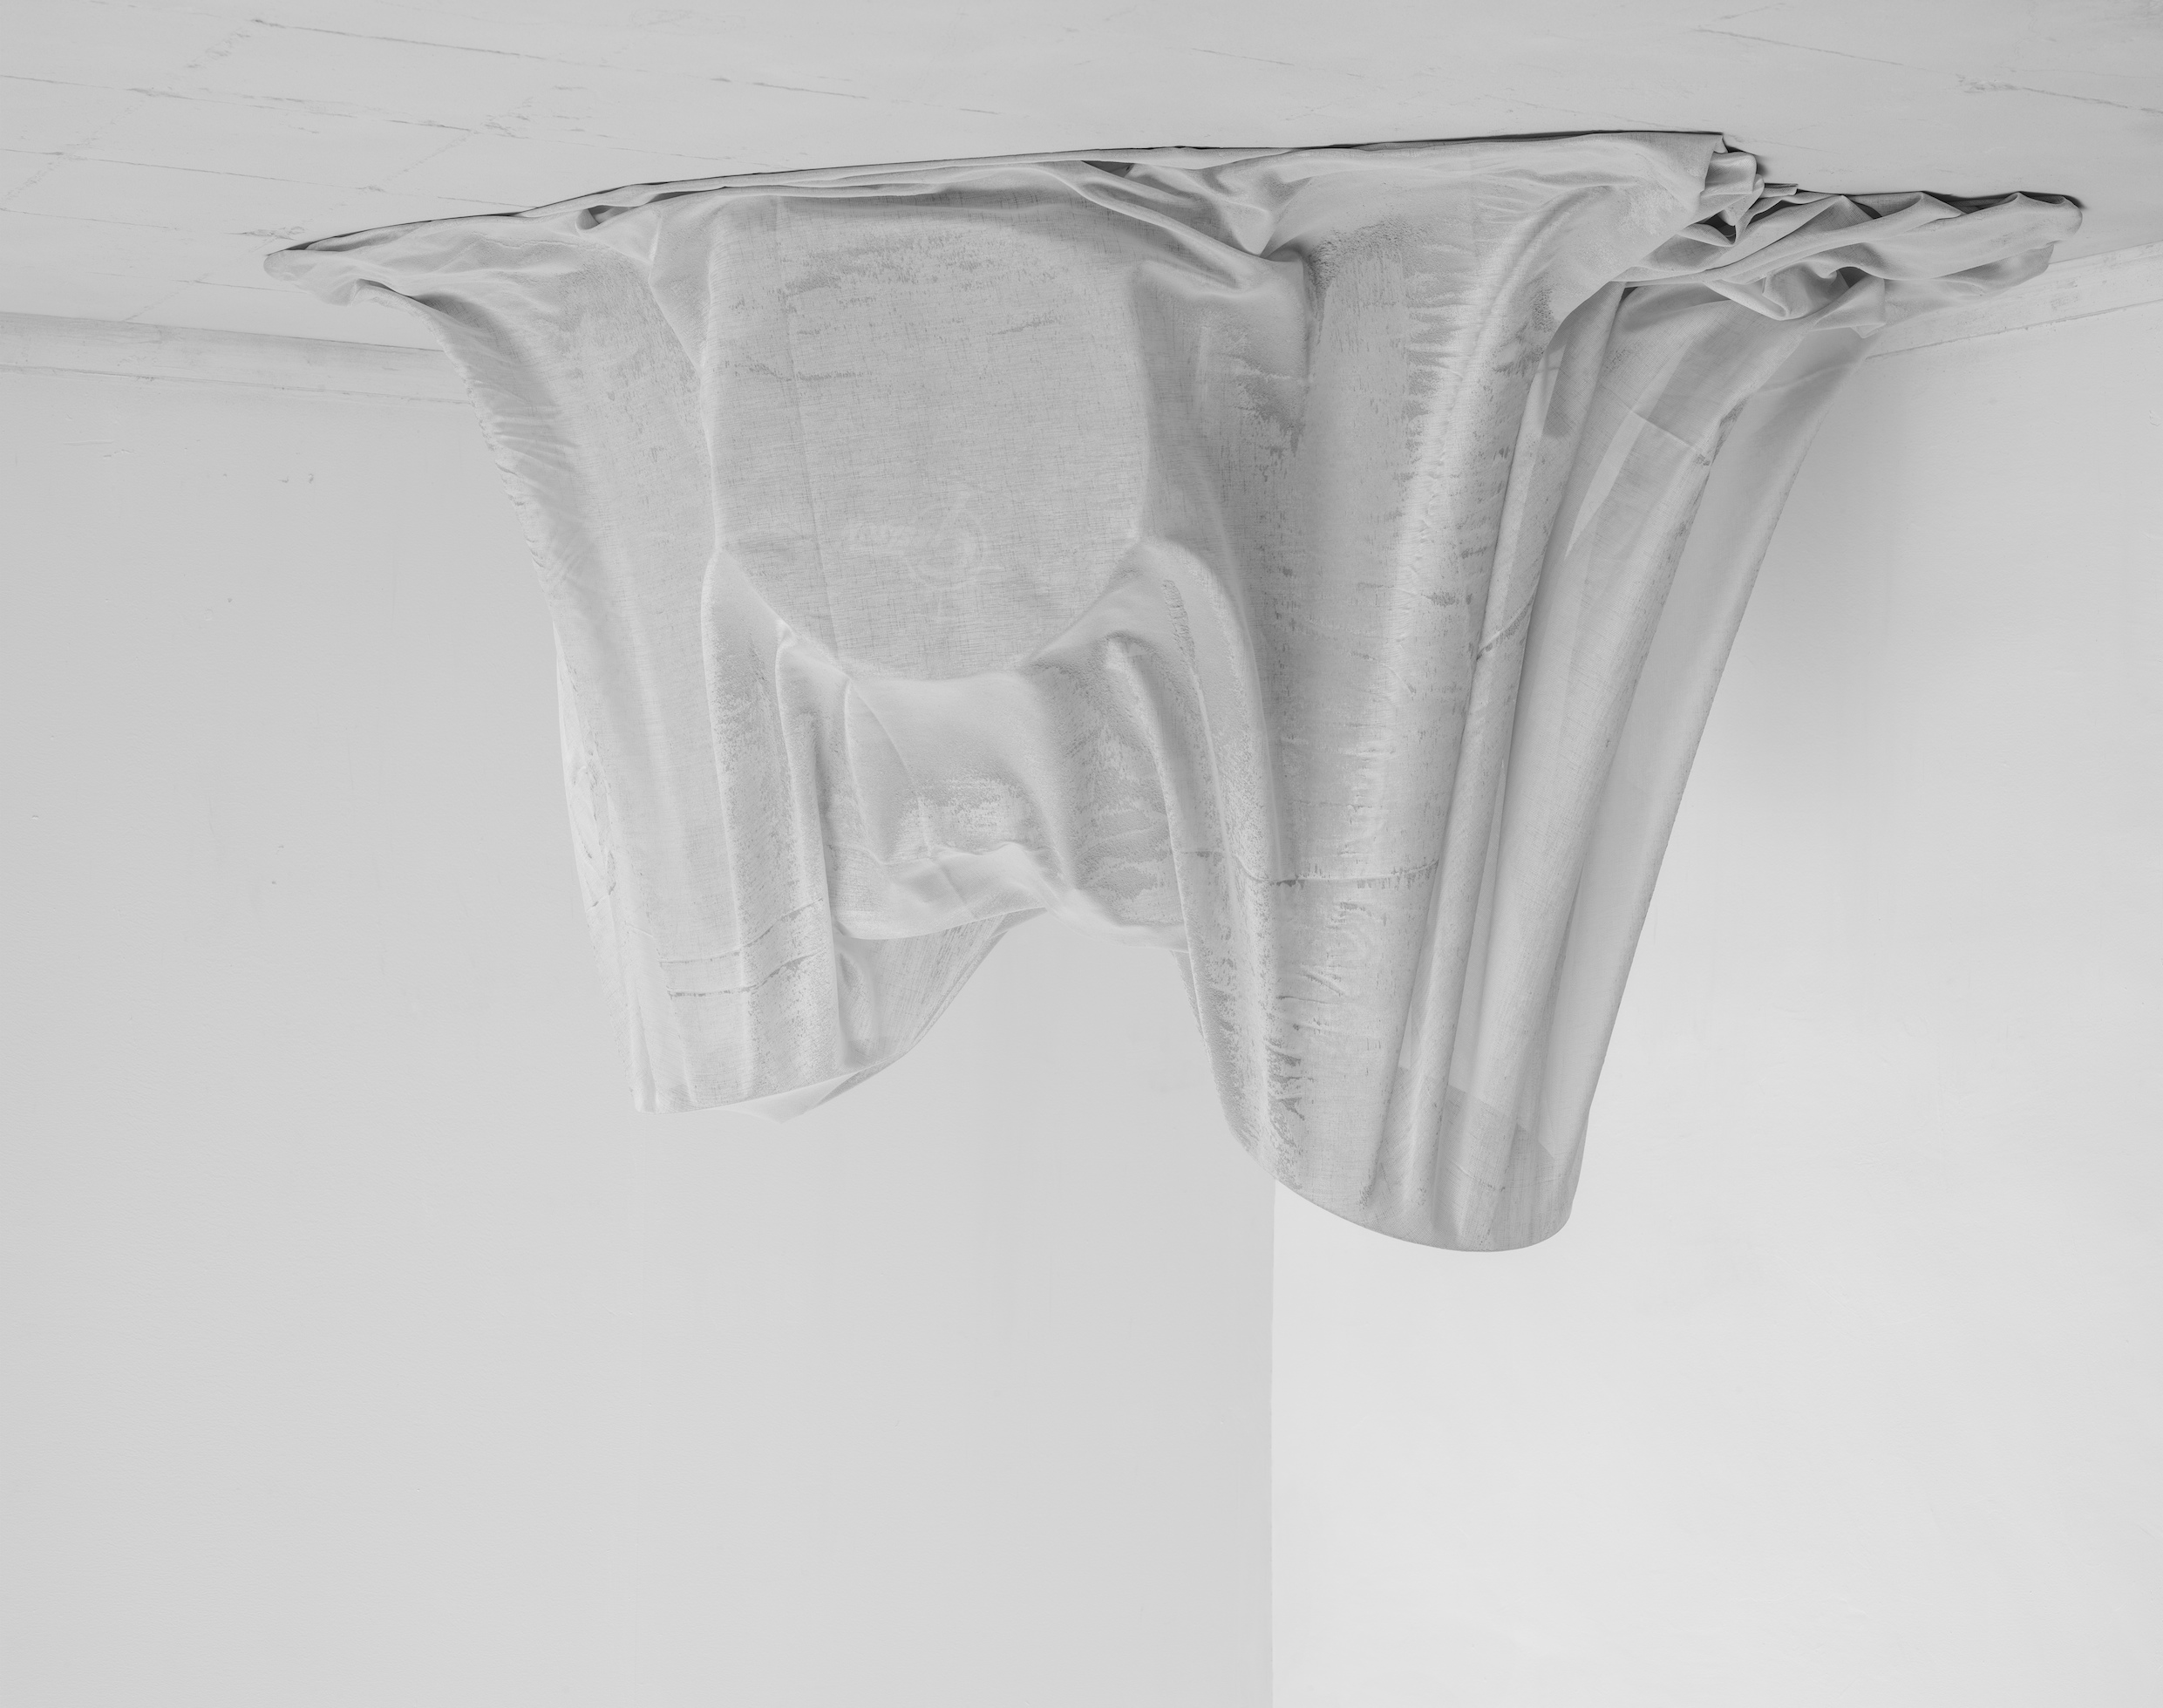 Ji Zhou 计洲, Spectacle No.8 景之八, 2013, Ultra Giclee 艺术微喷, 150 x 190 cm